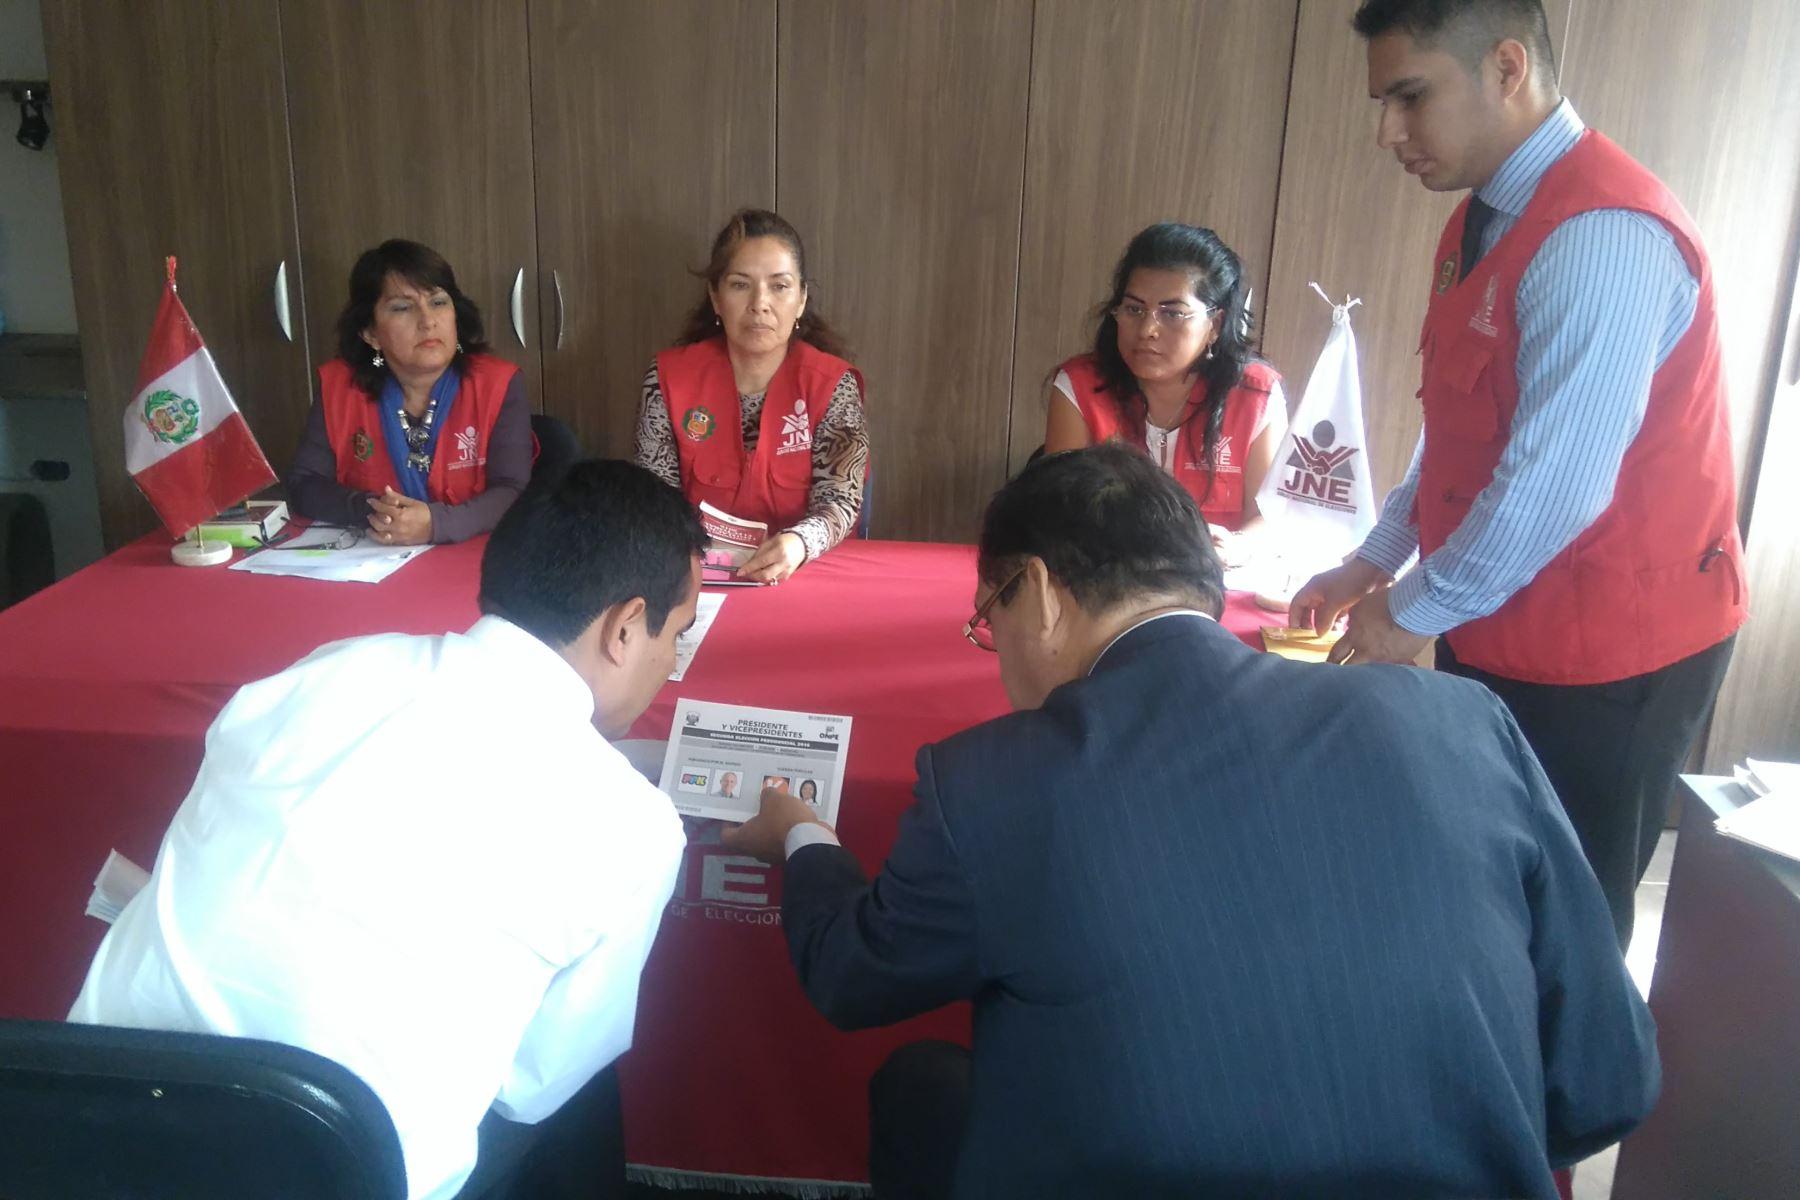 Un total de 23 listas postulan al Gobierno Regional de Áncash, reveló el JEE de Huaraz. ANDINA